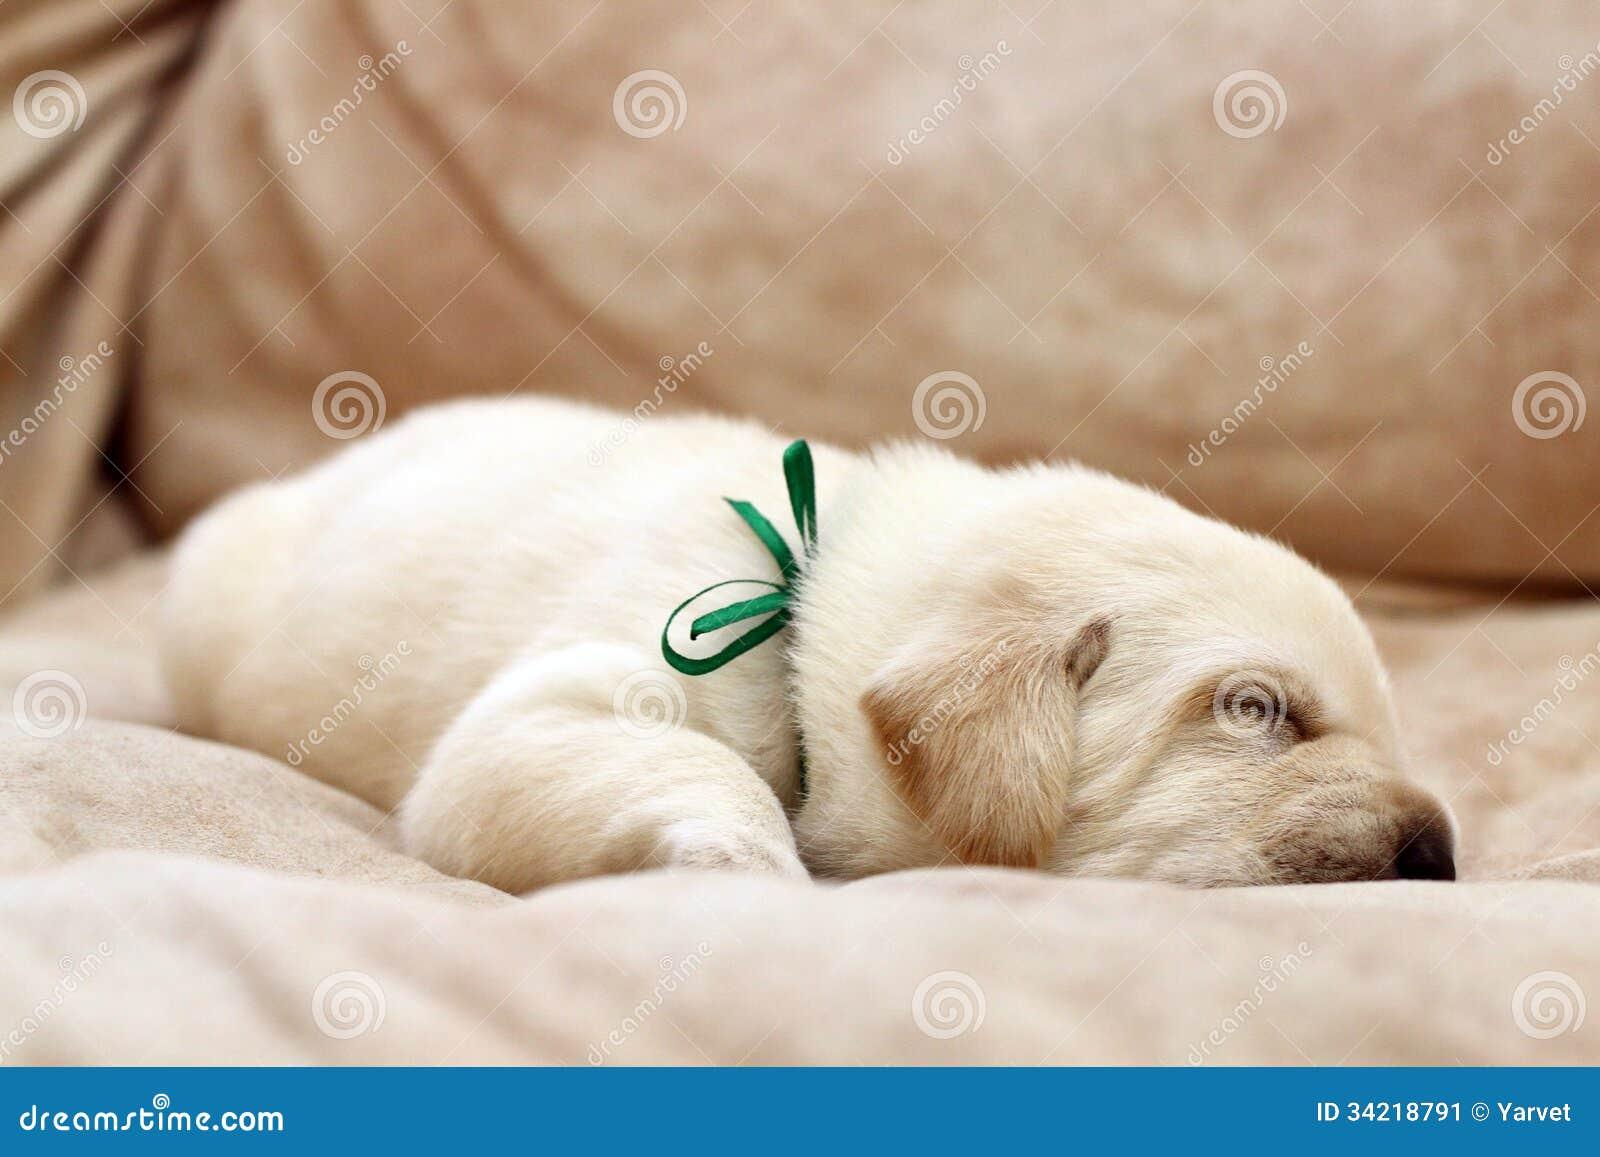 yellow lab puppy sleeping - photo #13